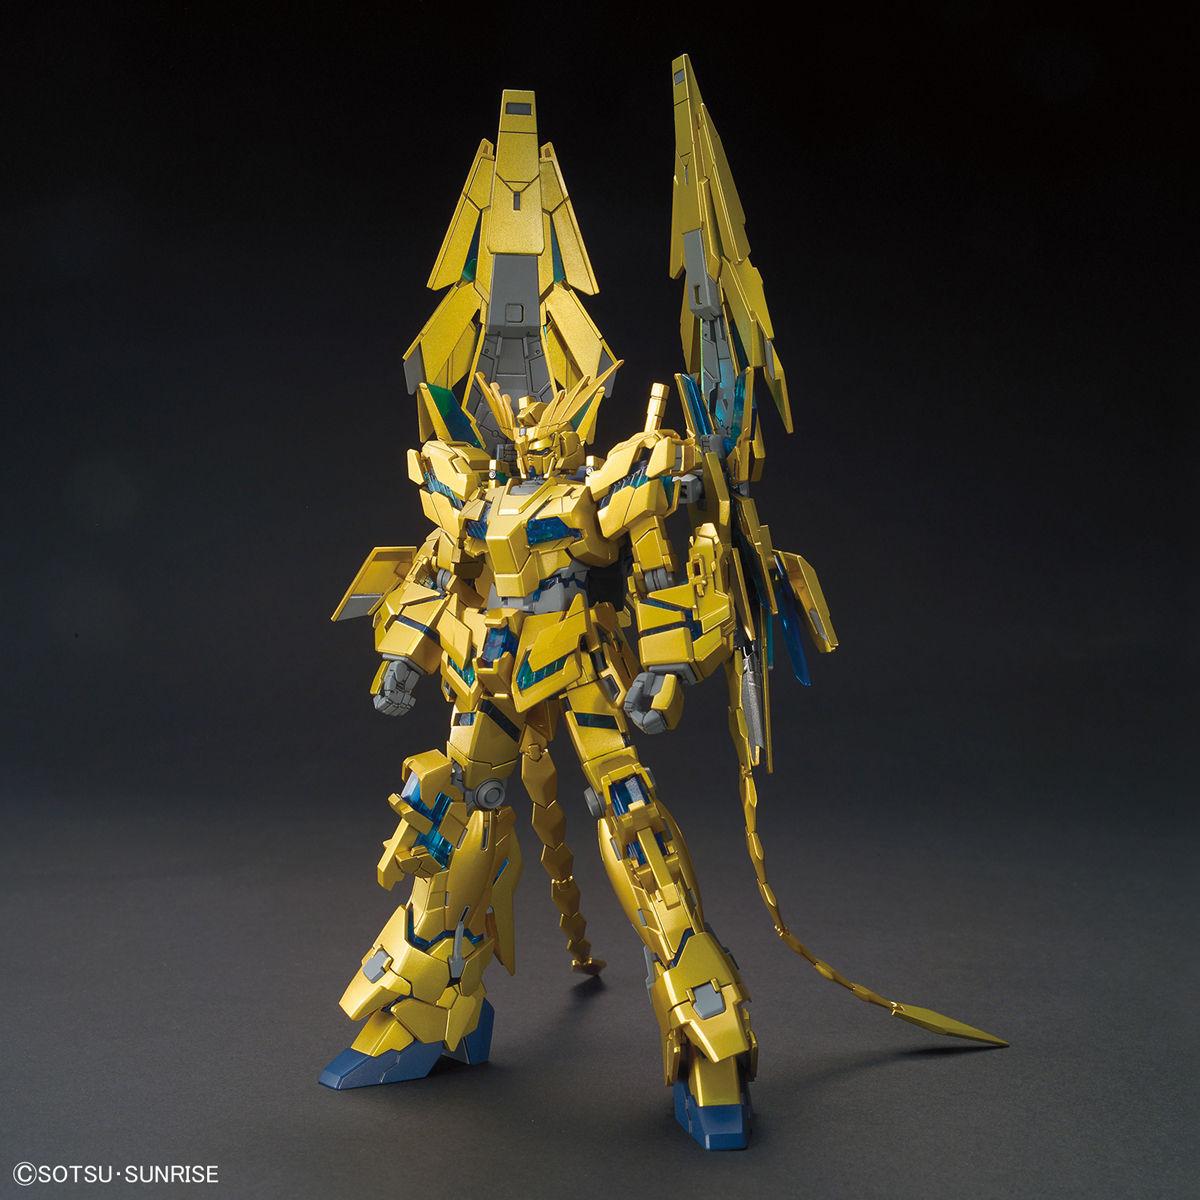 HGUC 1/144 ユニコーンガンダム3号機フェネクス(デストロイモード)(ナラティブVer.) [Unicorn Gundam 03 Phenex (Destroy Mode)(Narrative Ver.)] JAN:4549660299653 0229965 5059250